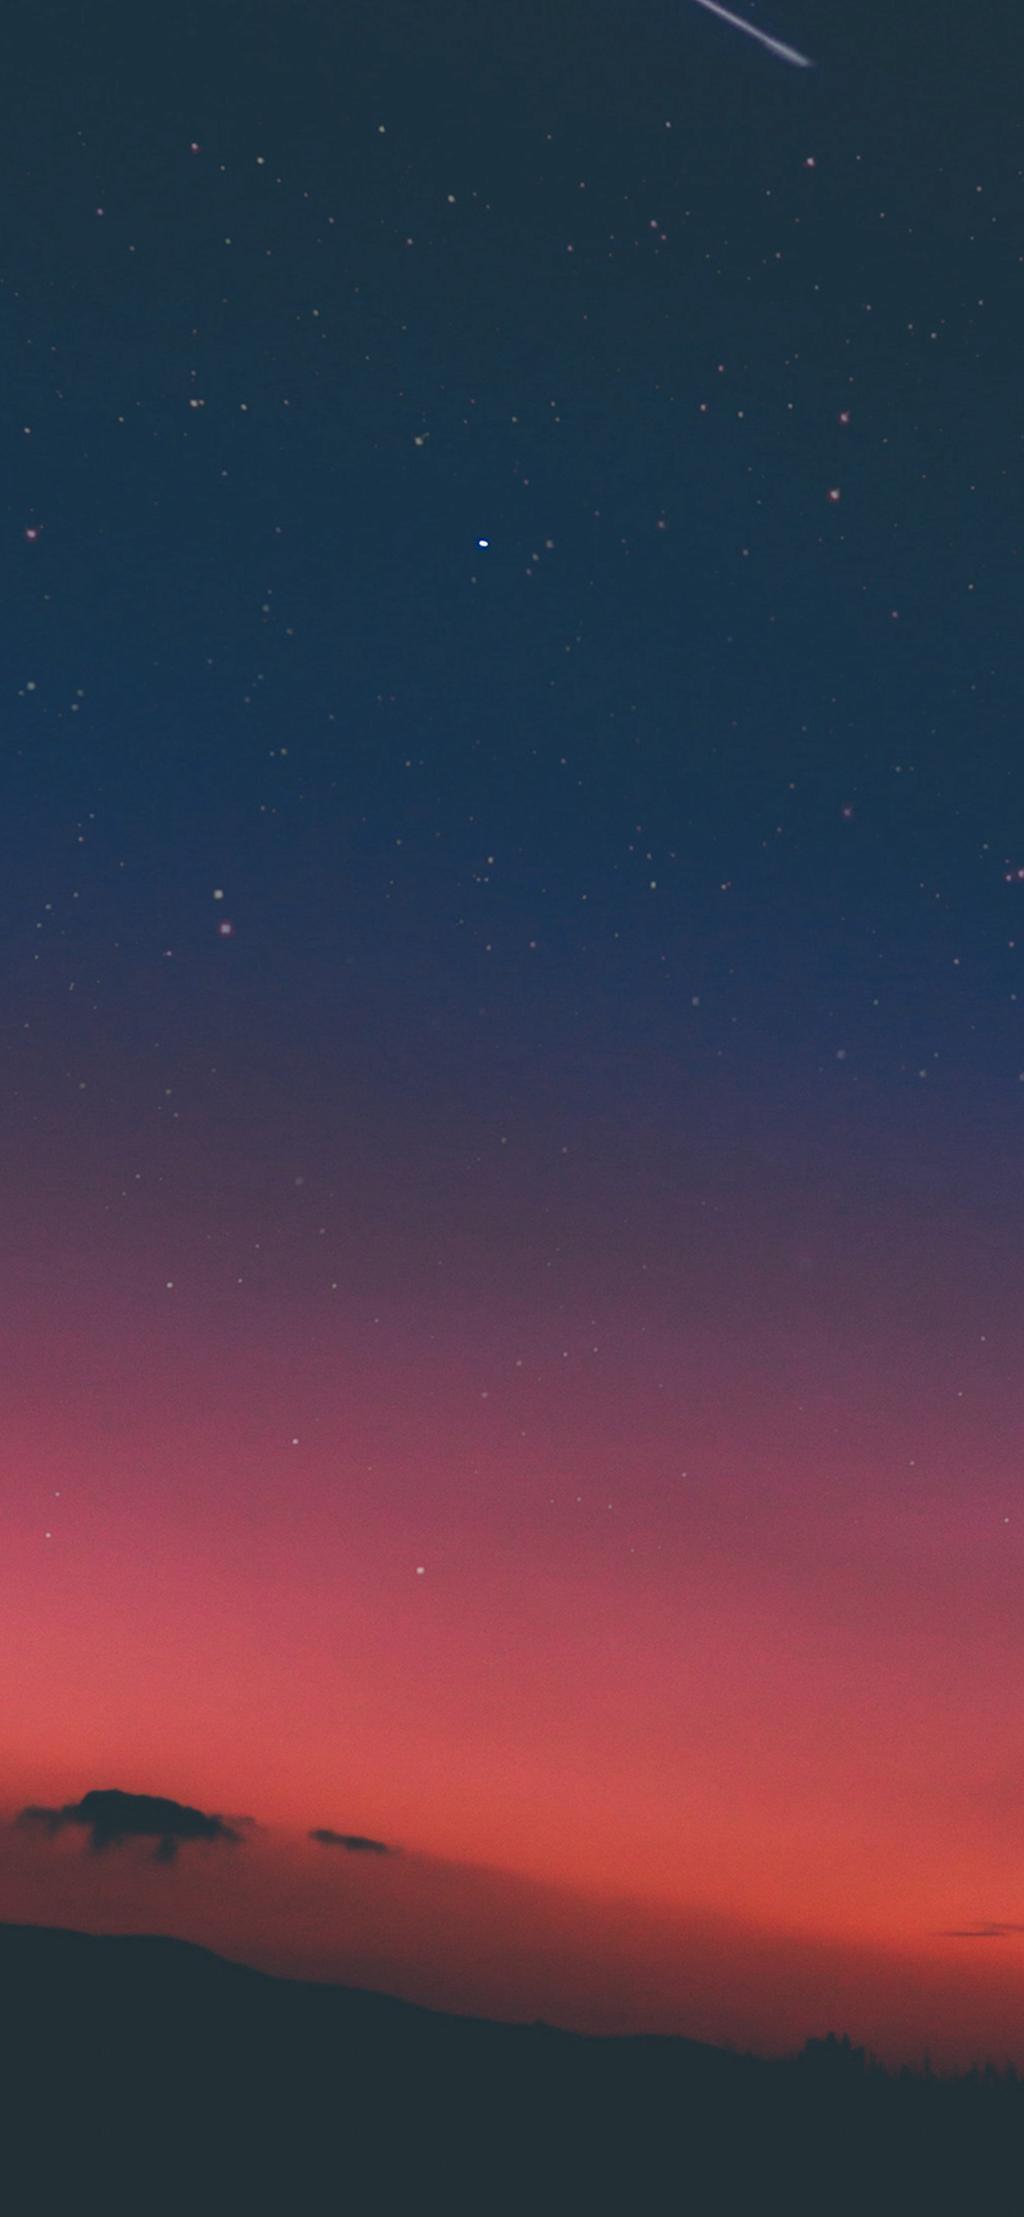 Galaxy S8 Wallpaper Hd 夜晚的星空 锁屏图片 高清手机壁纸 风景 回车桌面